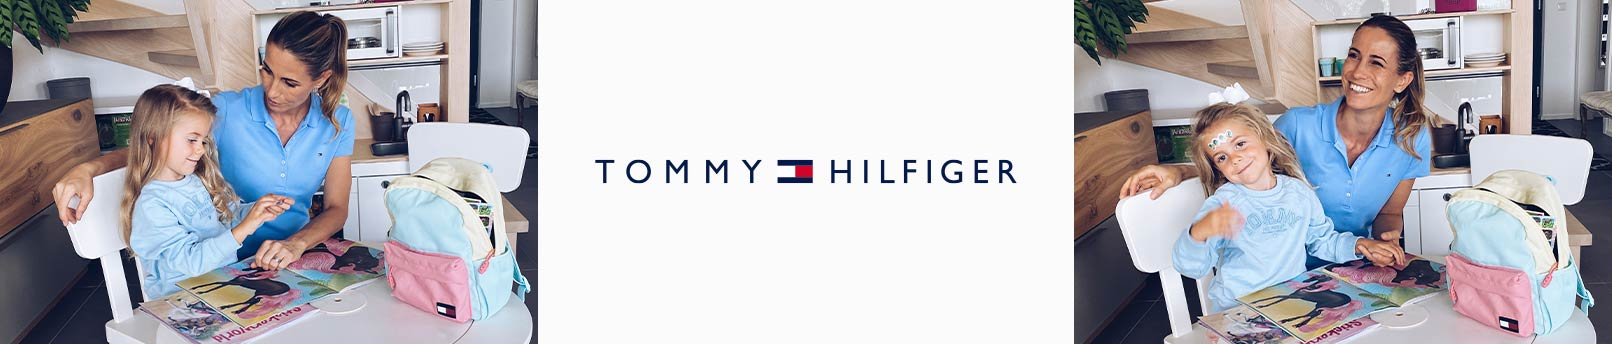 Découvrir Tommy Hilfiger